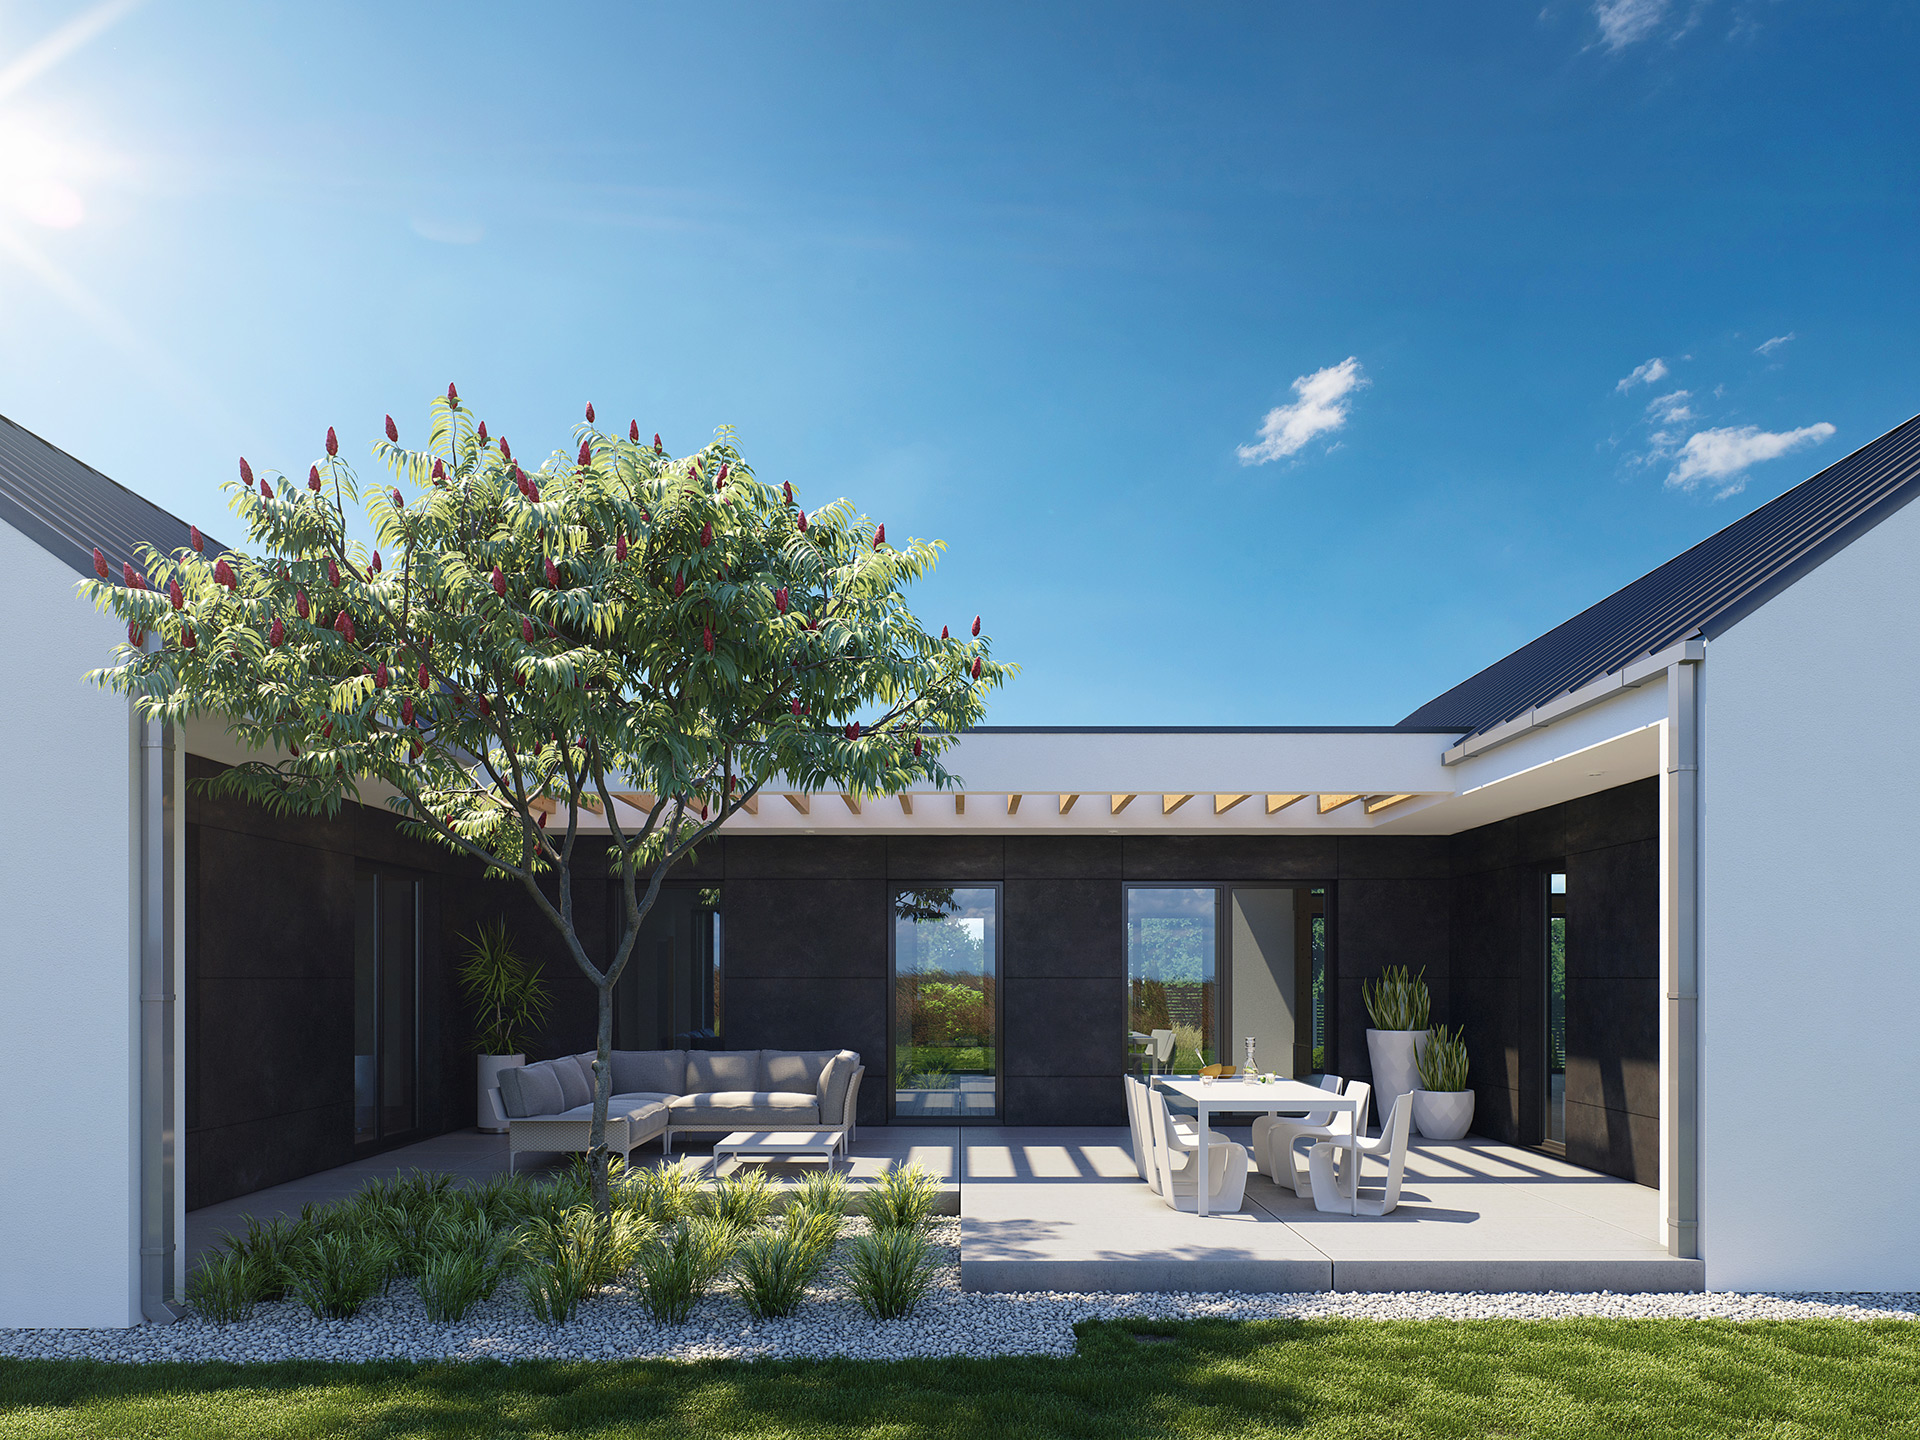 3D House Visualization Patio